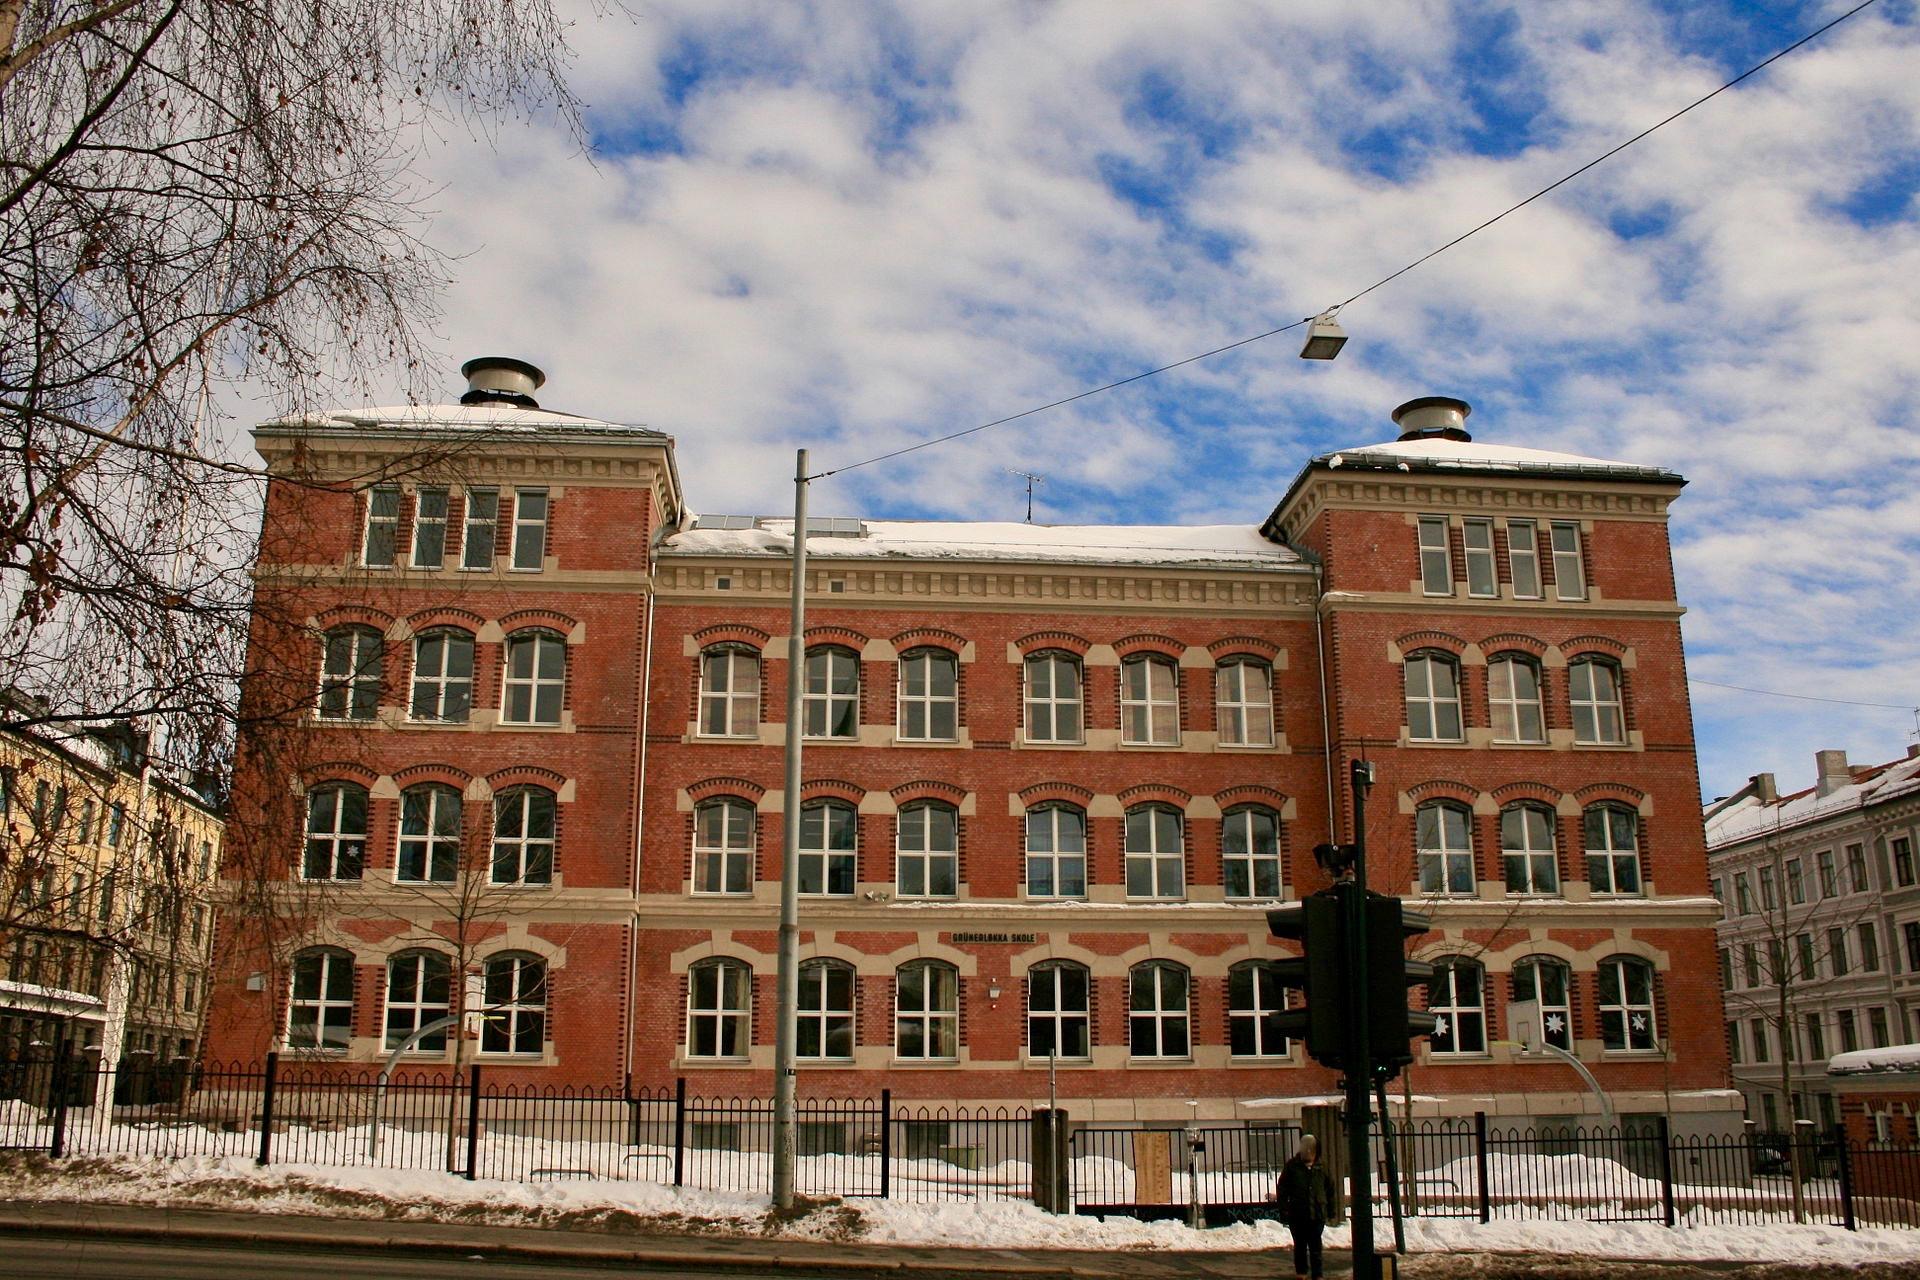 Beskyttet: Grünerløkka skole